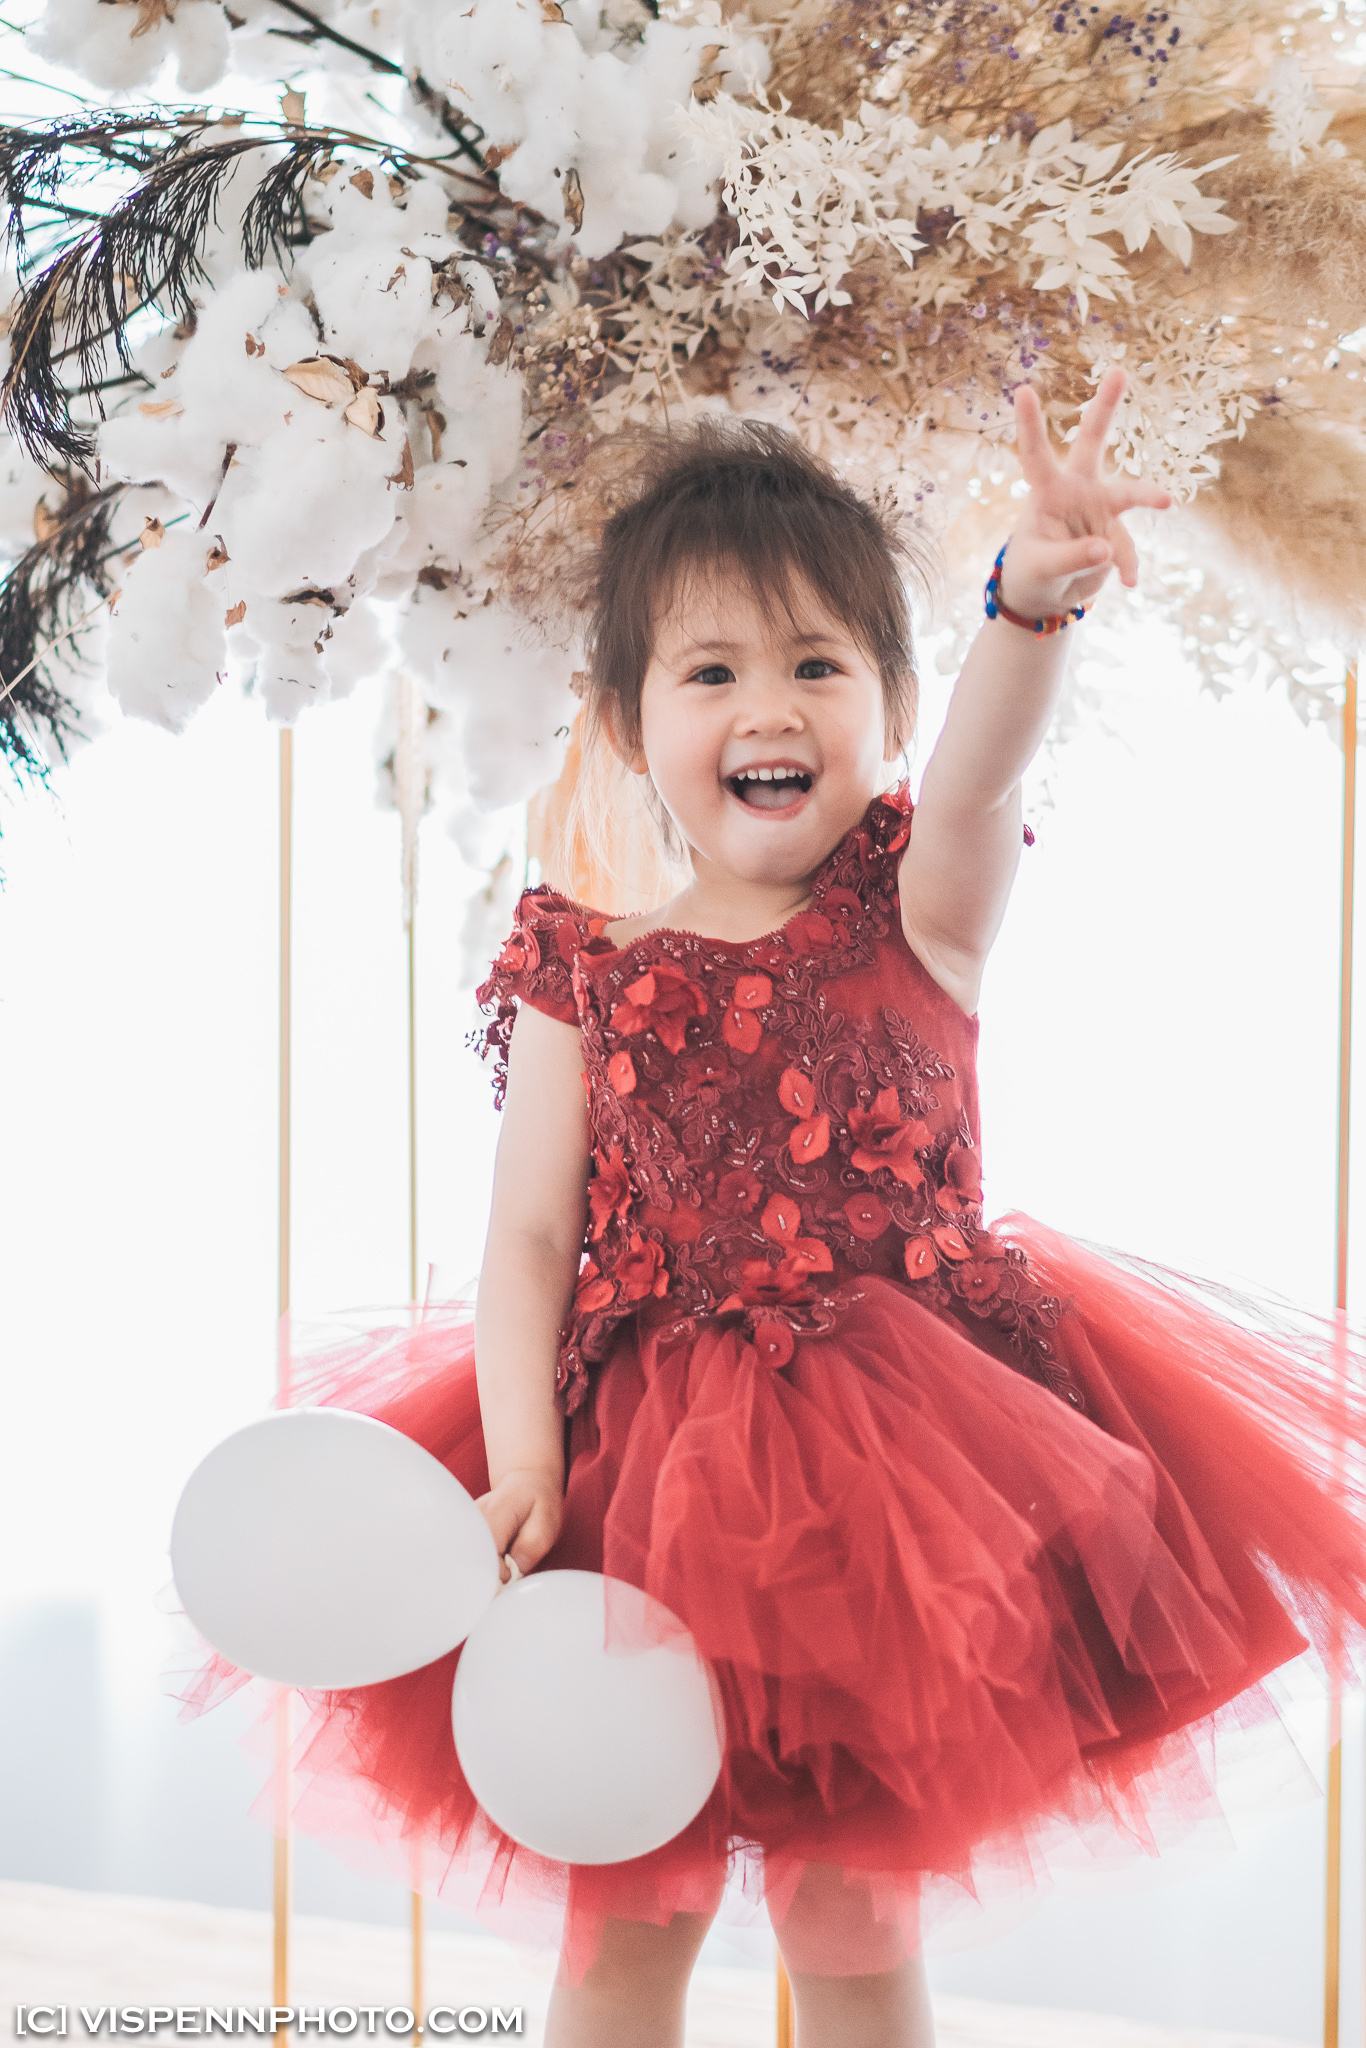 Melbourne Baby Family Birthday Party Photographer 墨尔本 百日宴 满月宴 周岁宴 摄影 VISPENN ALINA 0263 Sony VISPENN